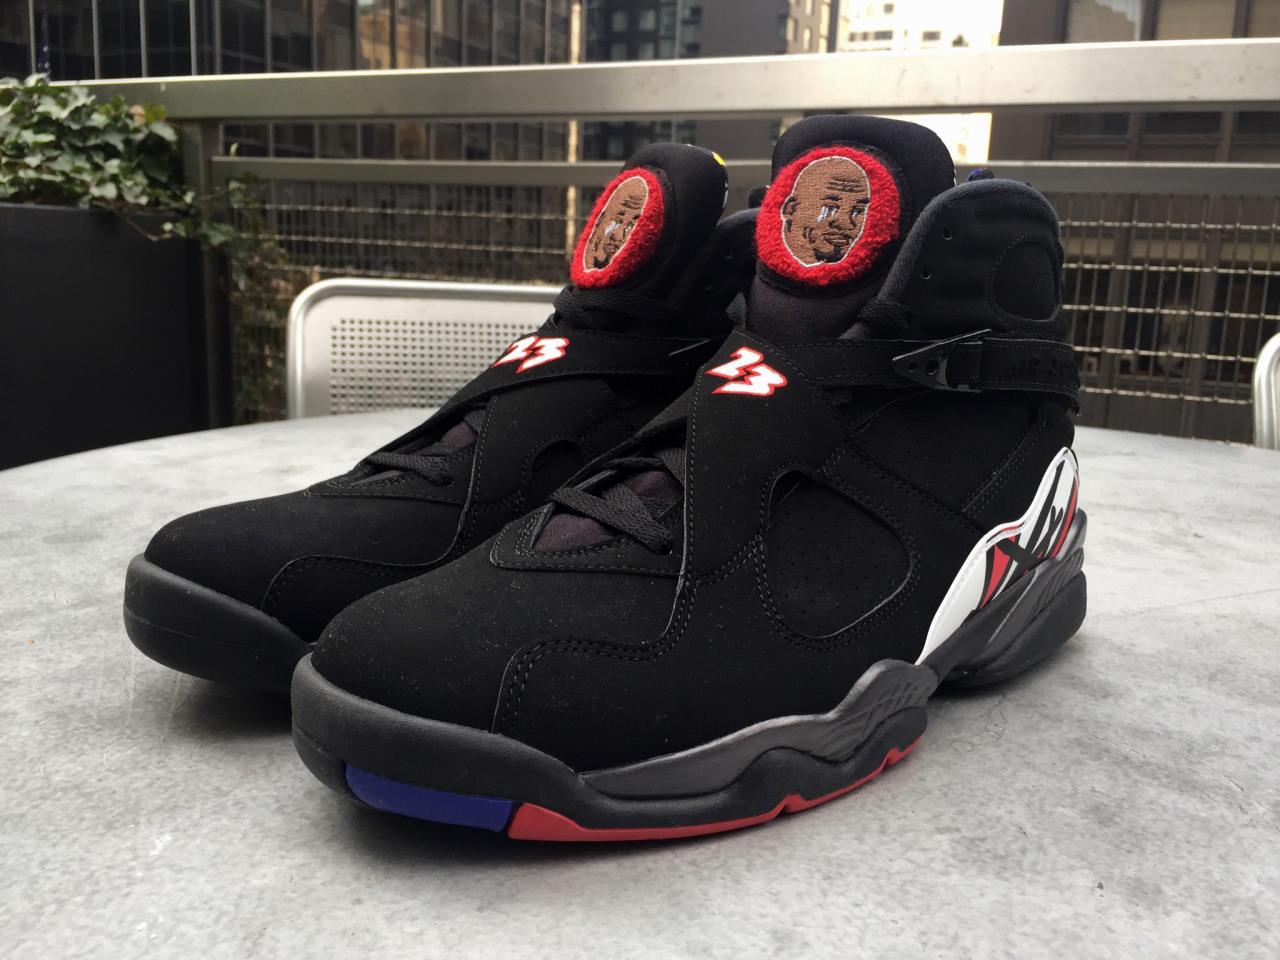 0613a04f115e8f Sneakerheads Made Some Custom Crying Air Jordan 8 s (Pics)